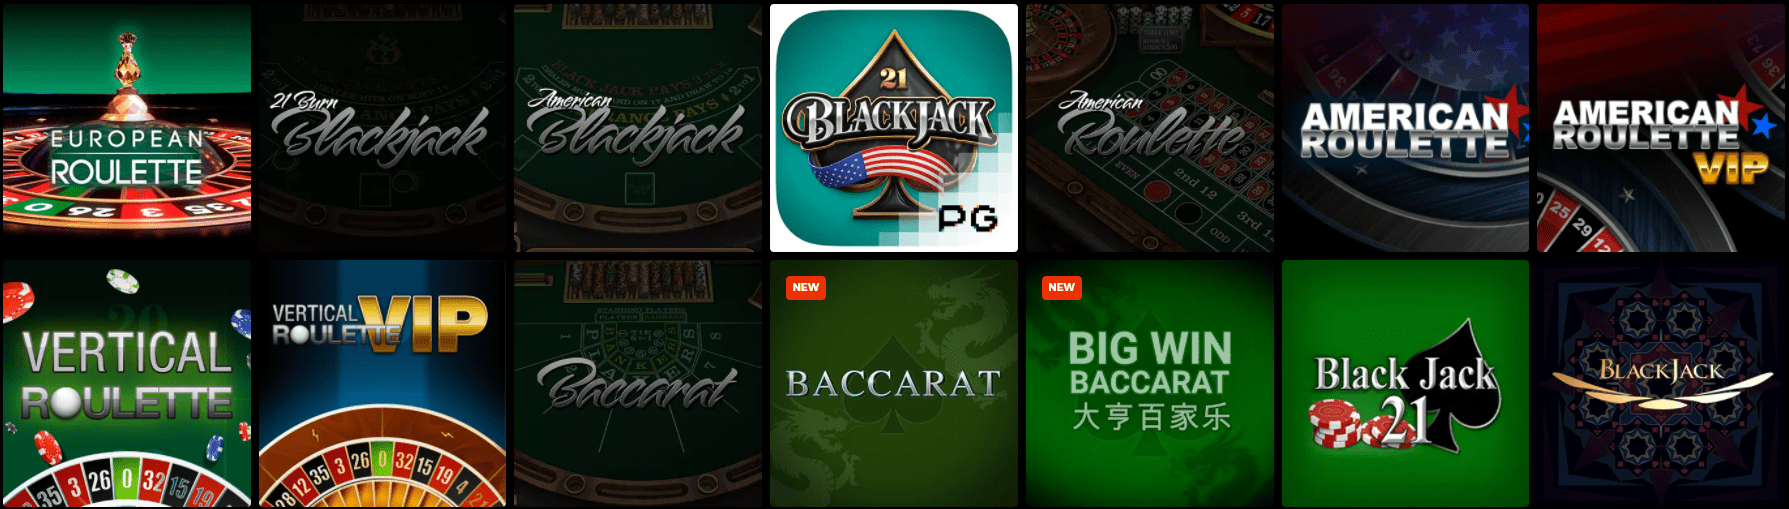 Live-Spiele im N1 Casino